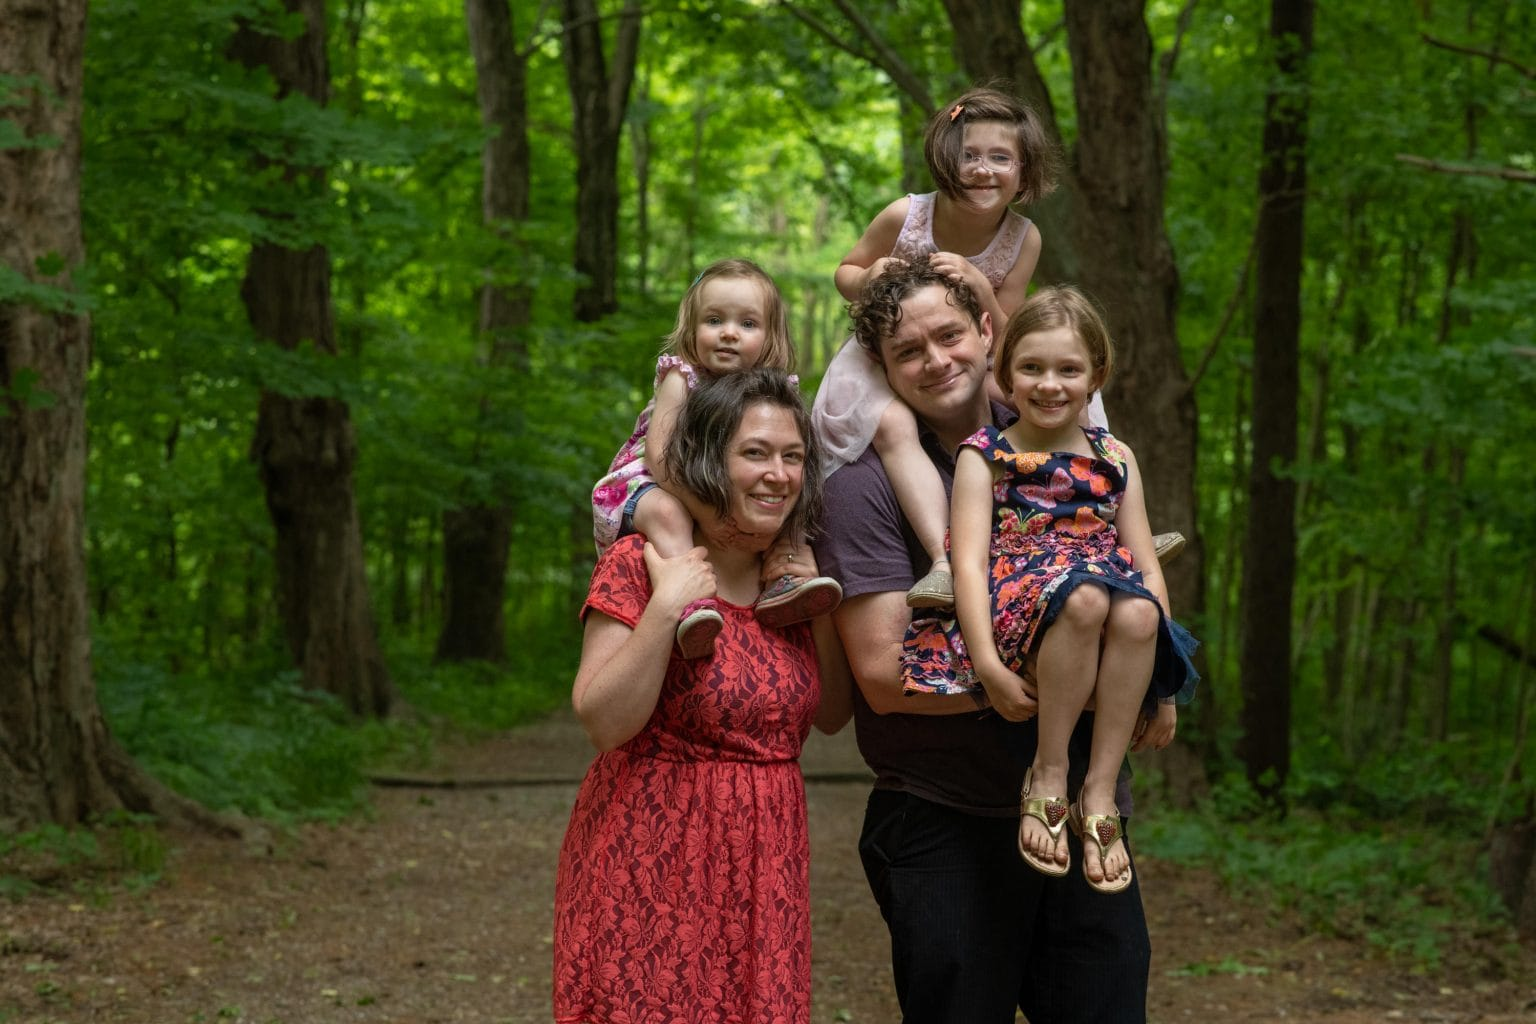 The Smyth Family